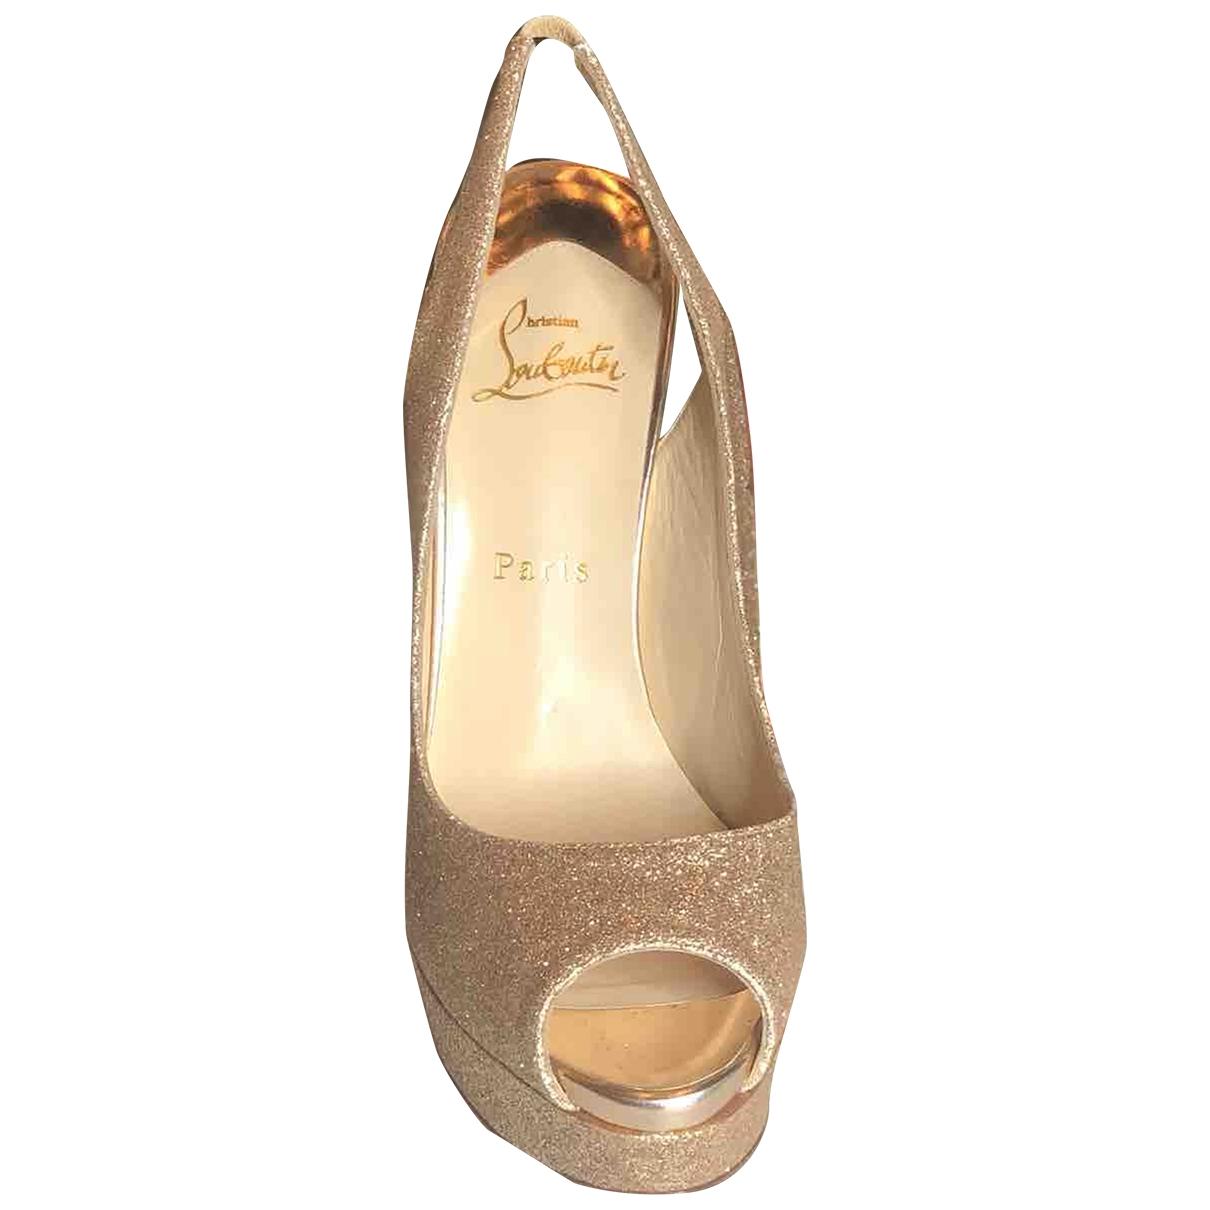 Christian Louboutin Lady Peep Gold Glitter Heels for Women 40.5 EU